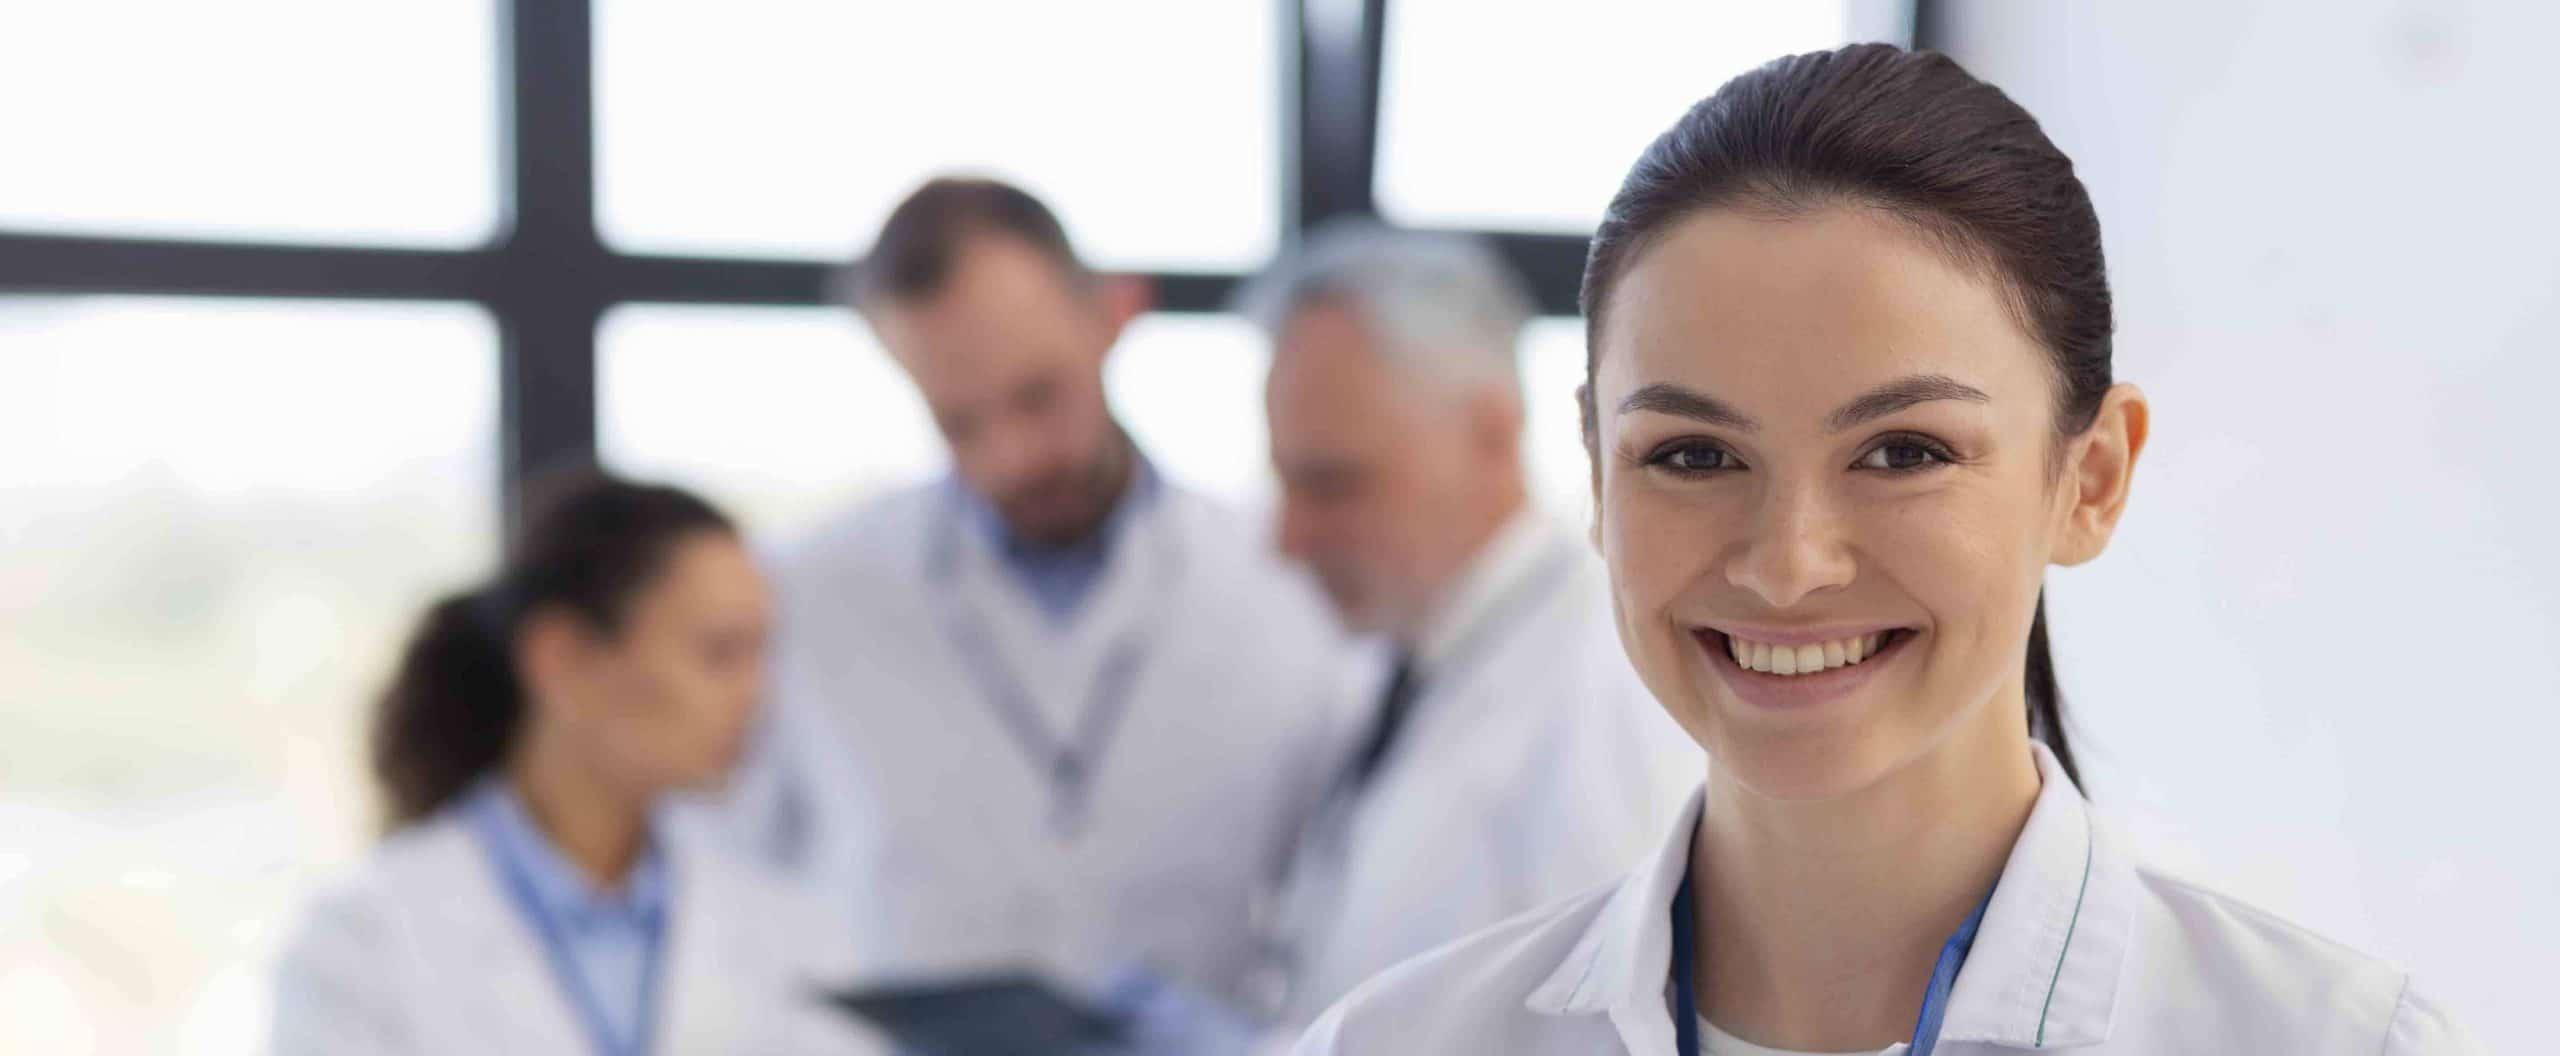 webinar gratuito inglés para empresas farmaceuticas